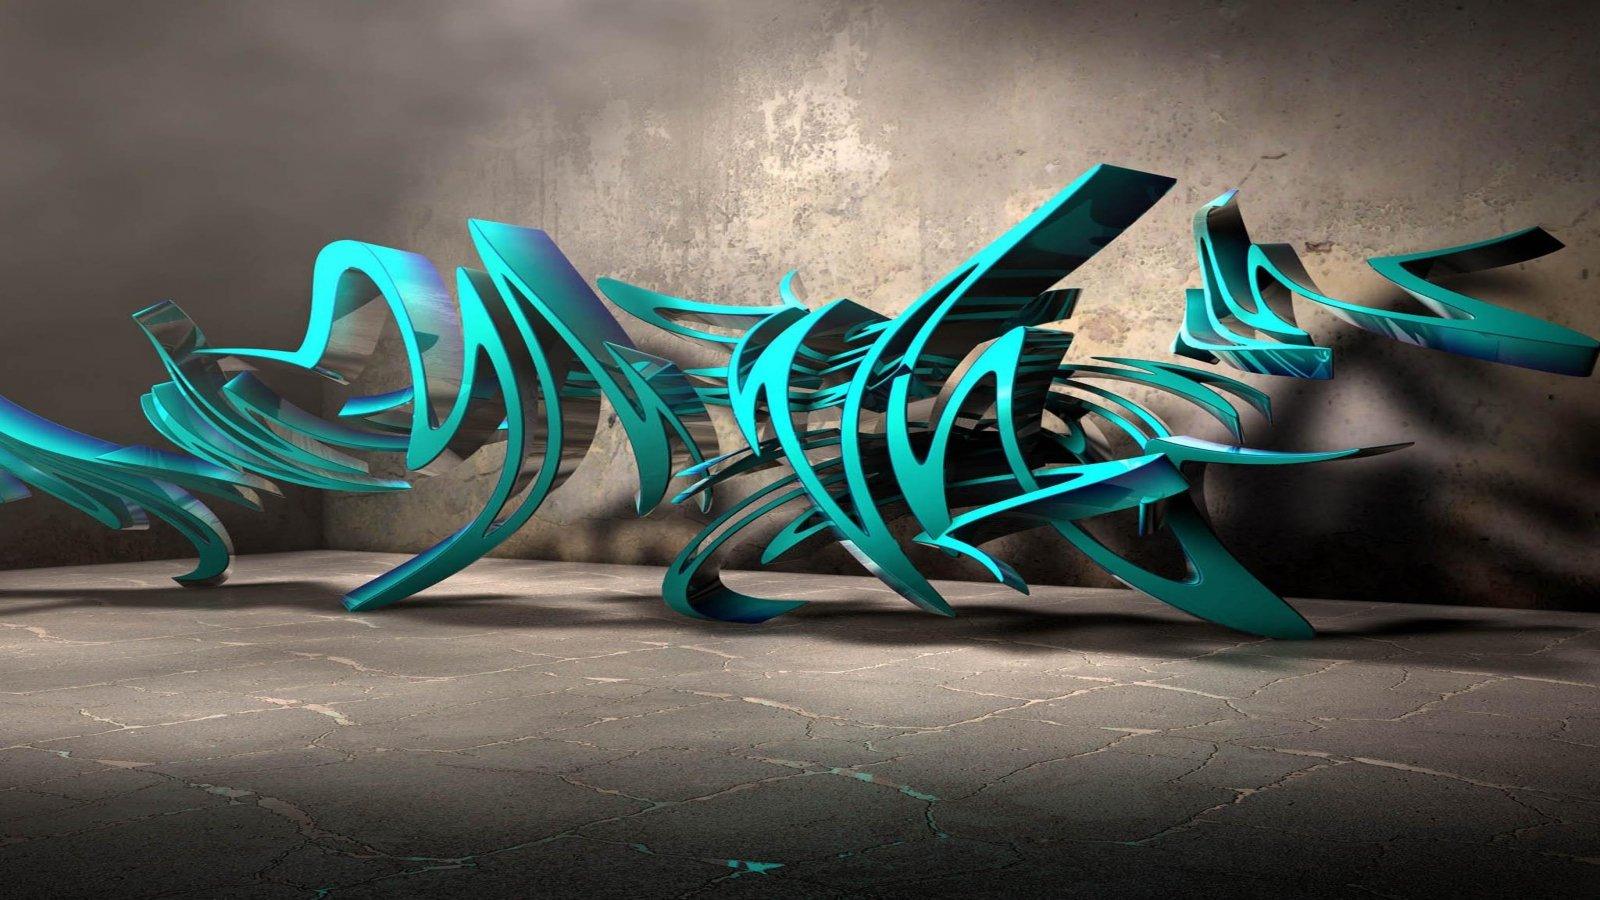 Graffiti creator on mobile - 3d Graffiti Wallpapers Wallpaper Area Hd Wallpapers Download